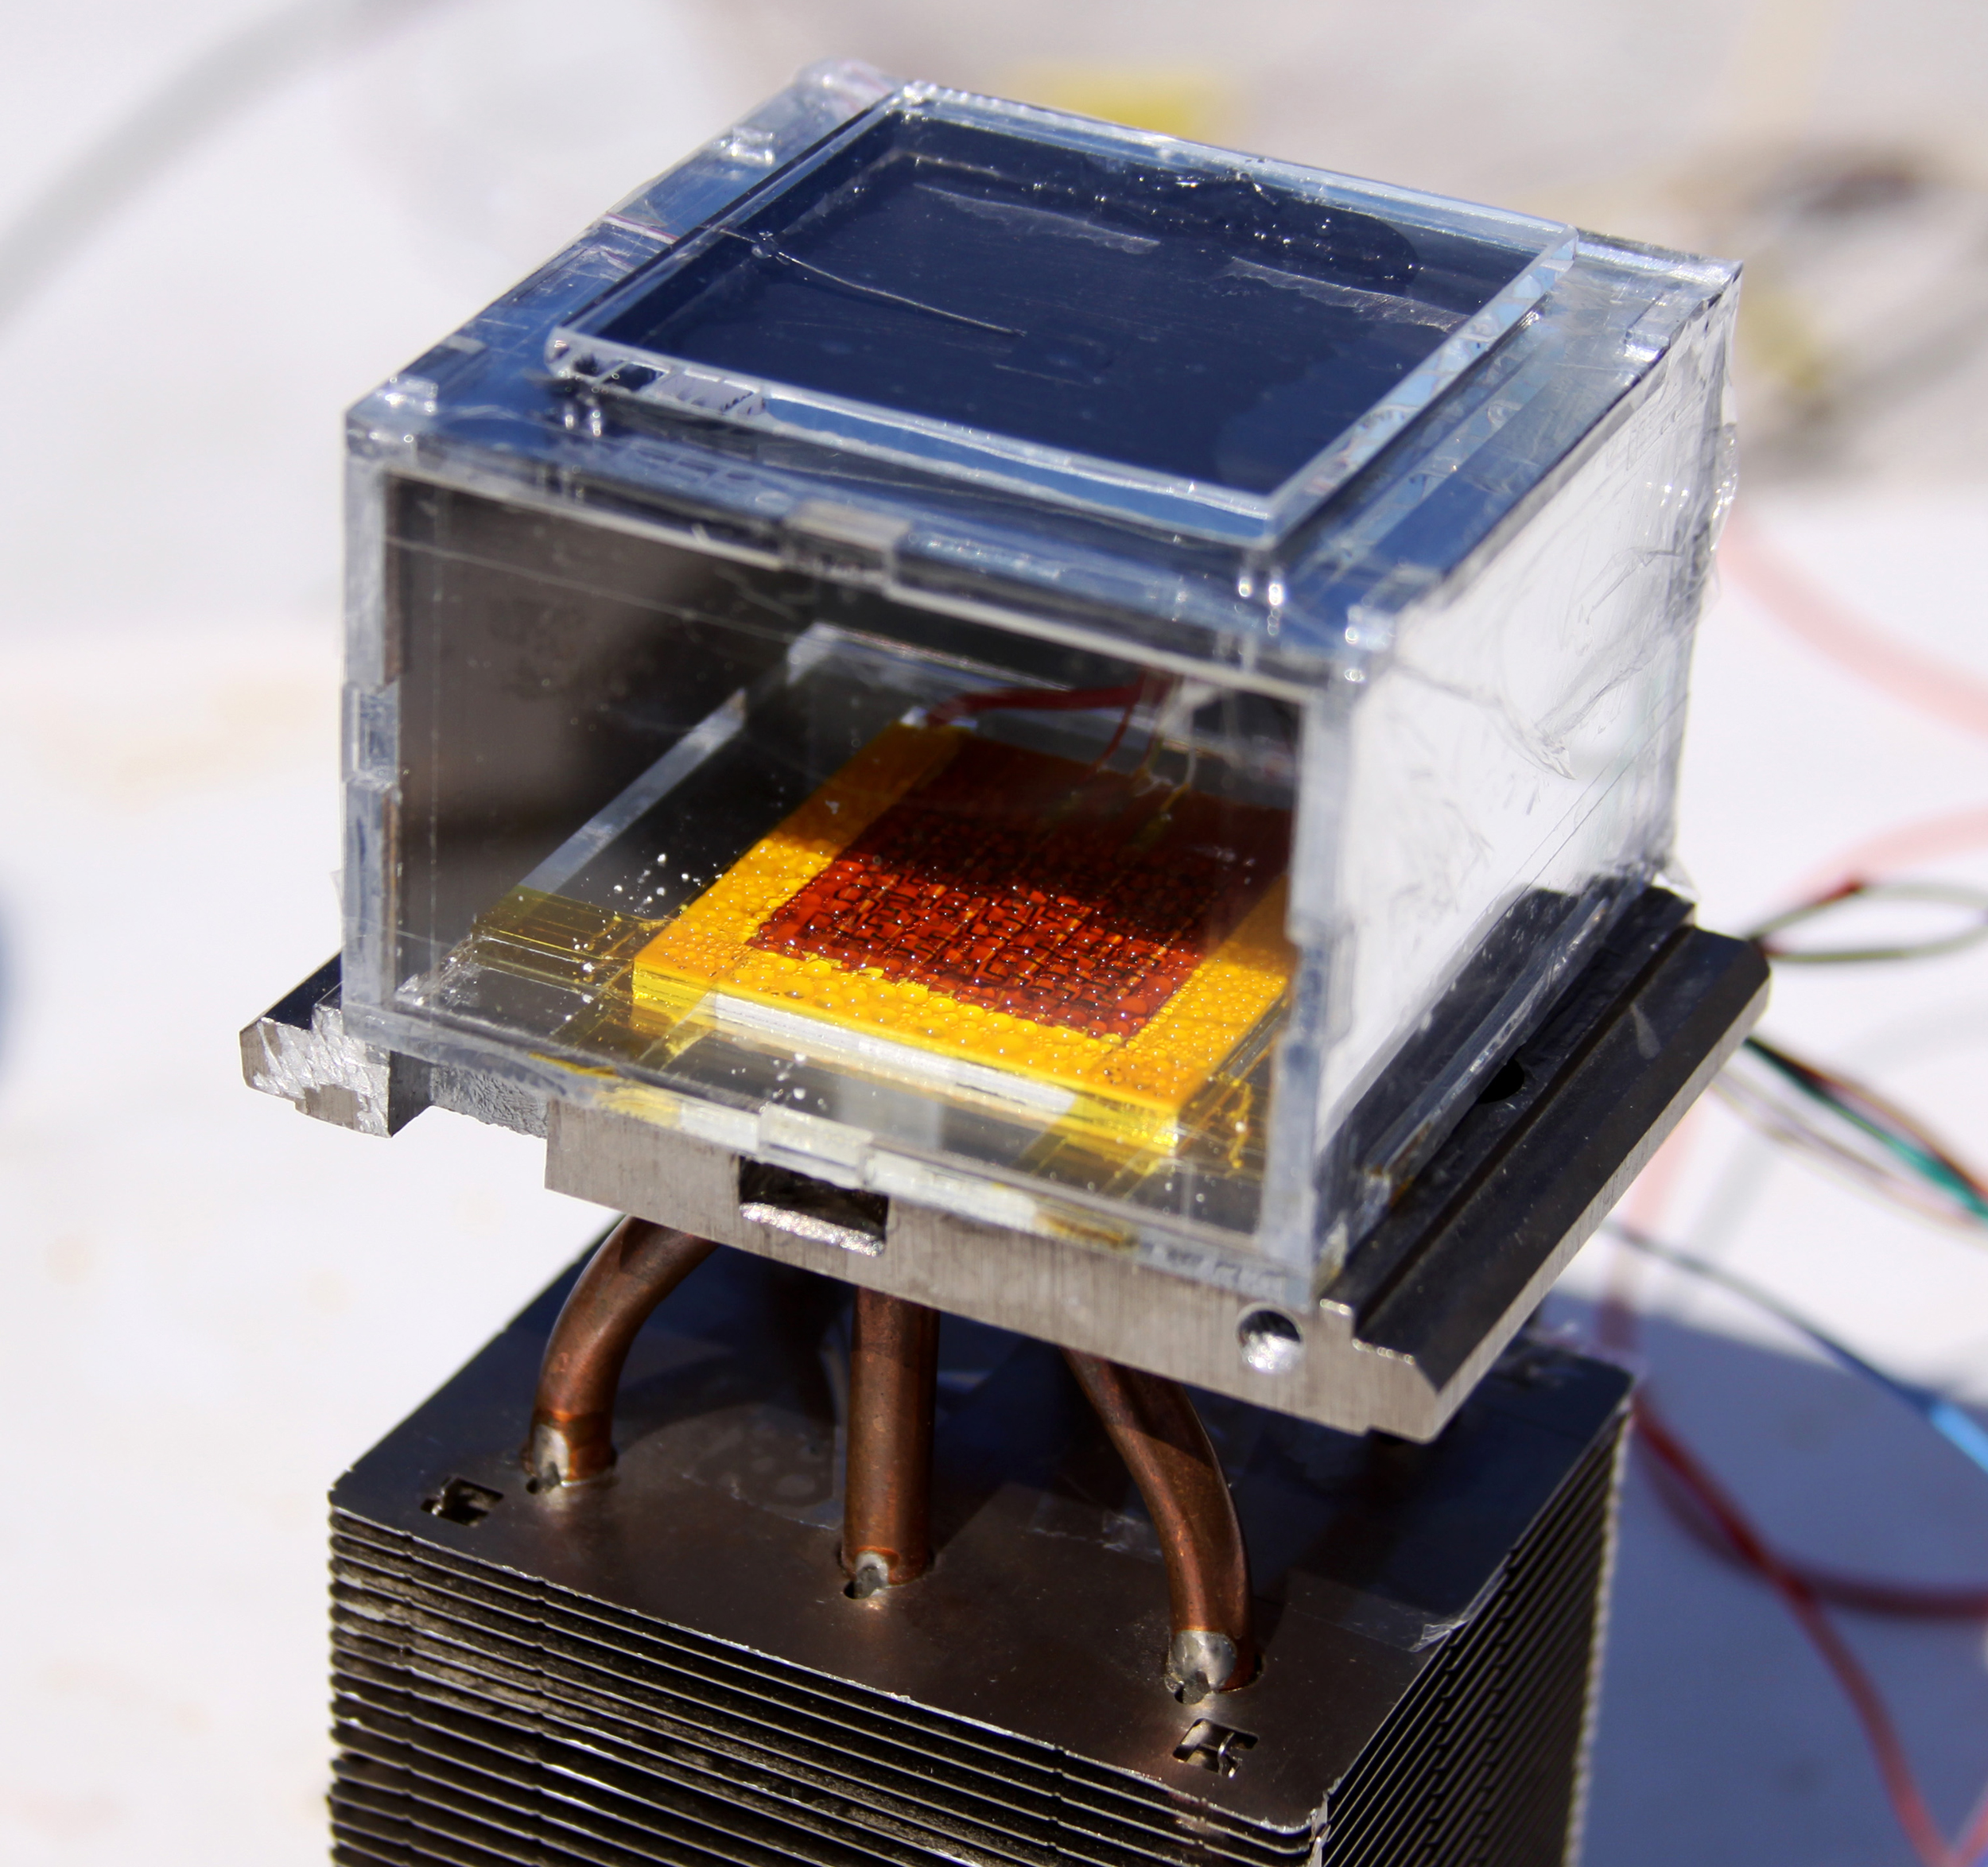 Image: Special crystals soak up atmospheric water like a sponge